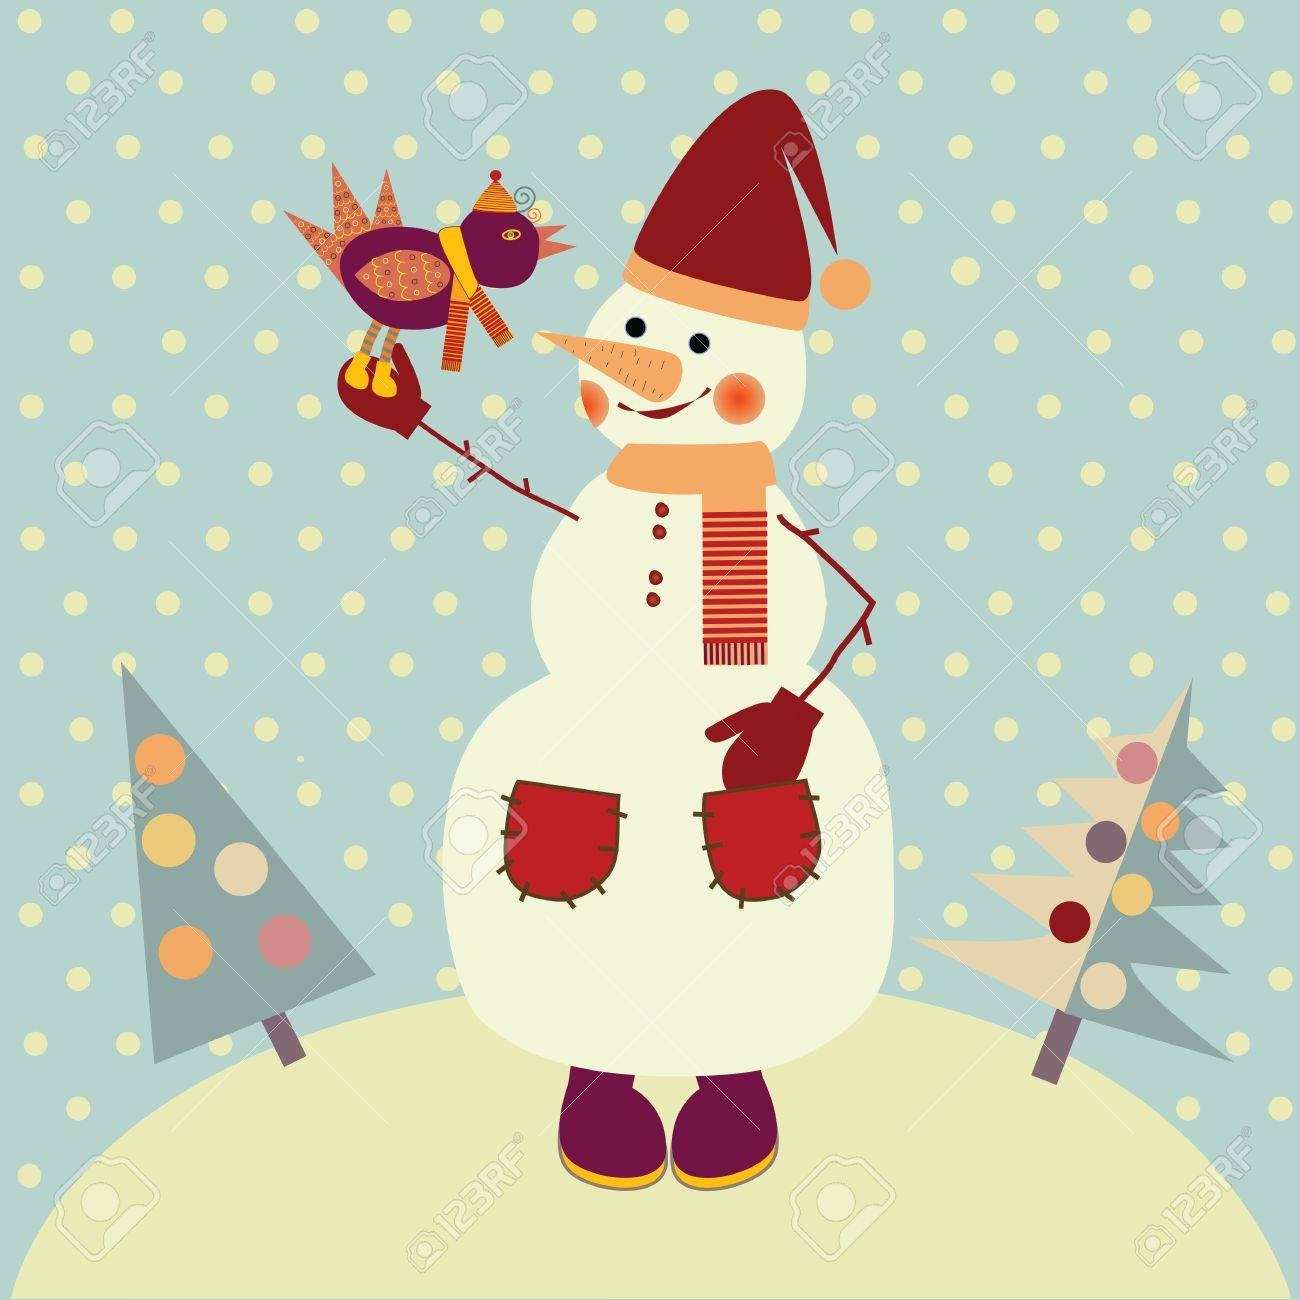 snowman with bird Stock Vector - 15684412